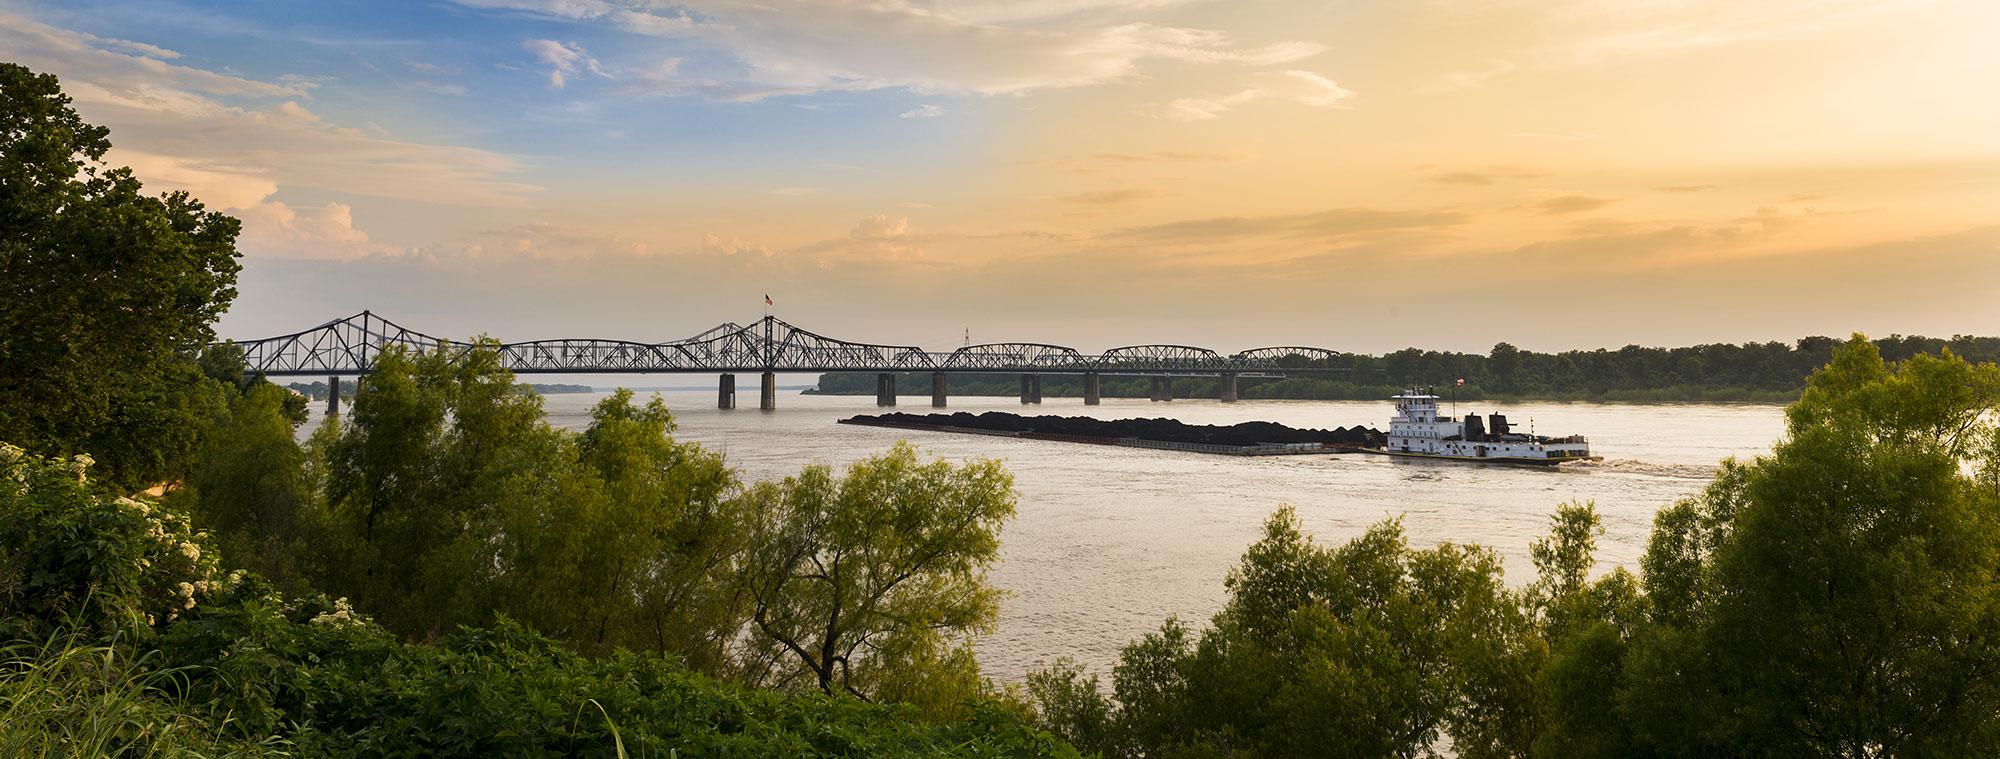 Mississippi addiction rehab near you